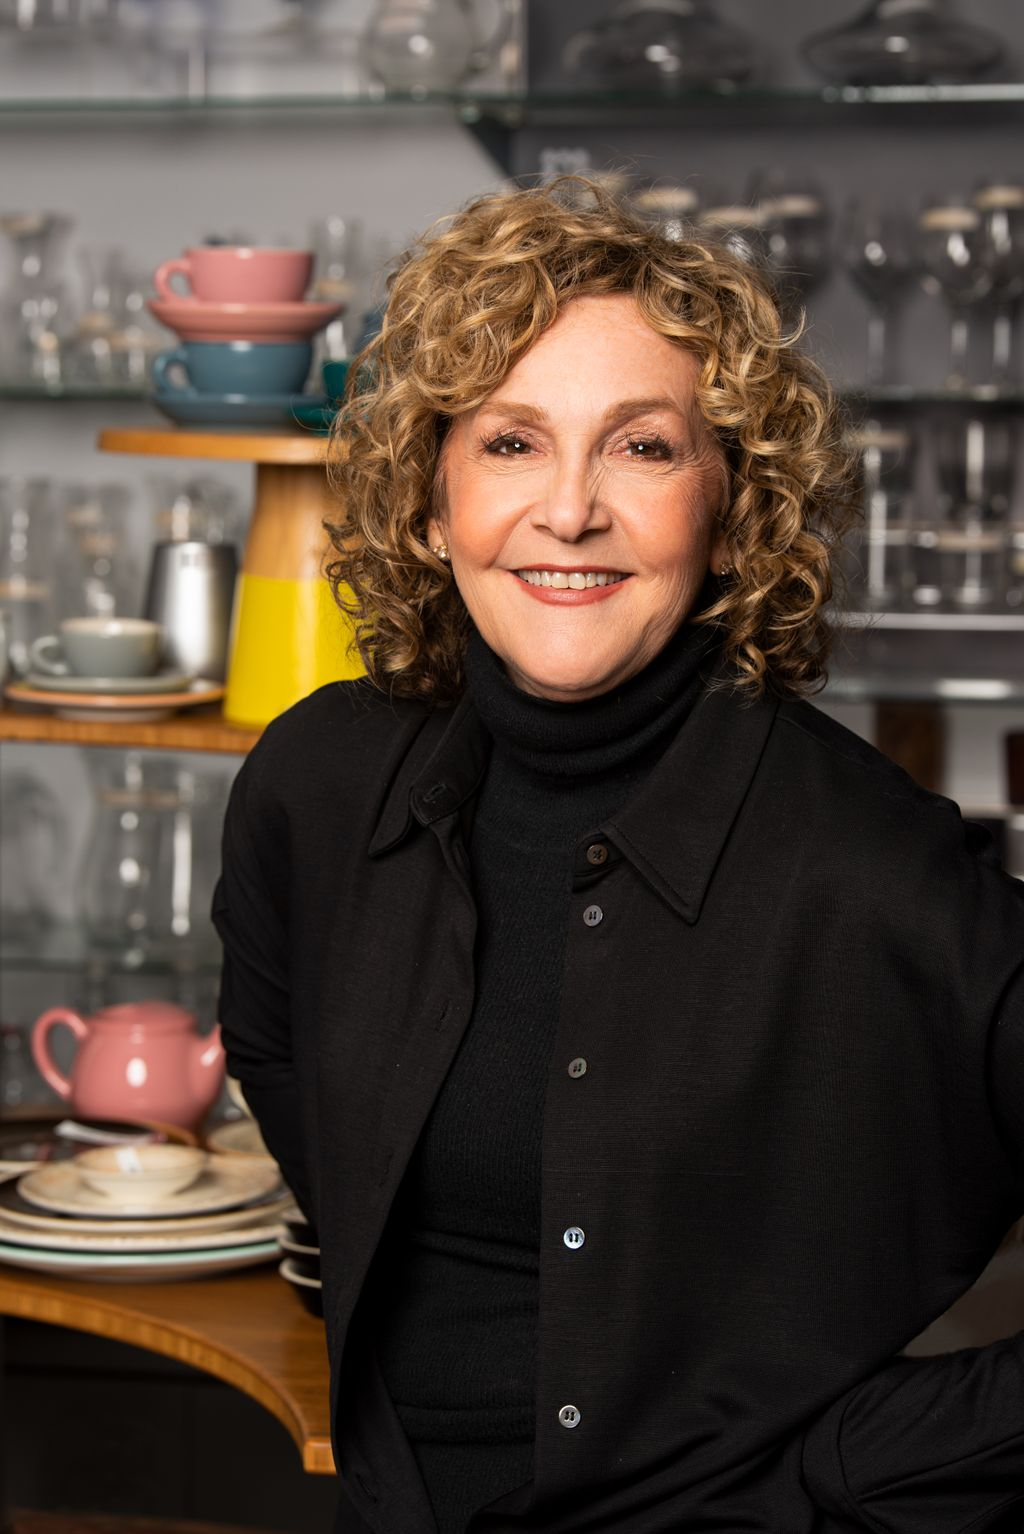 Photo for Restaurant Industry Magazine